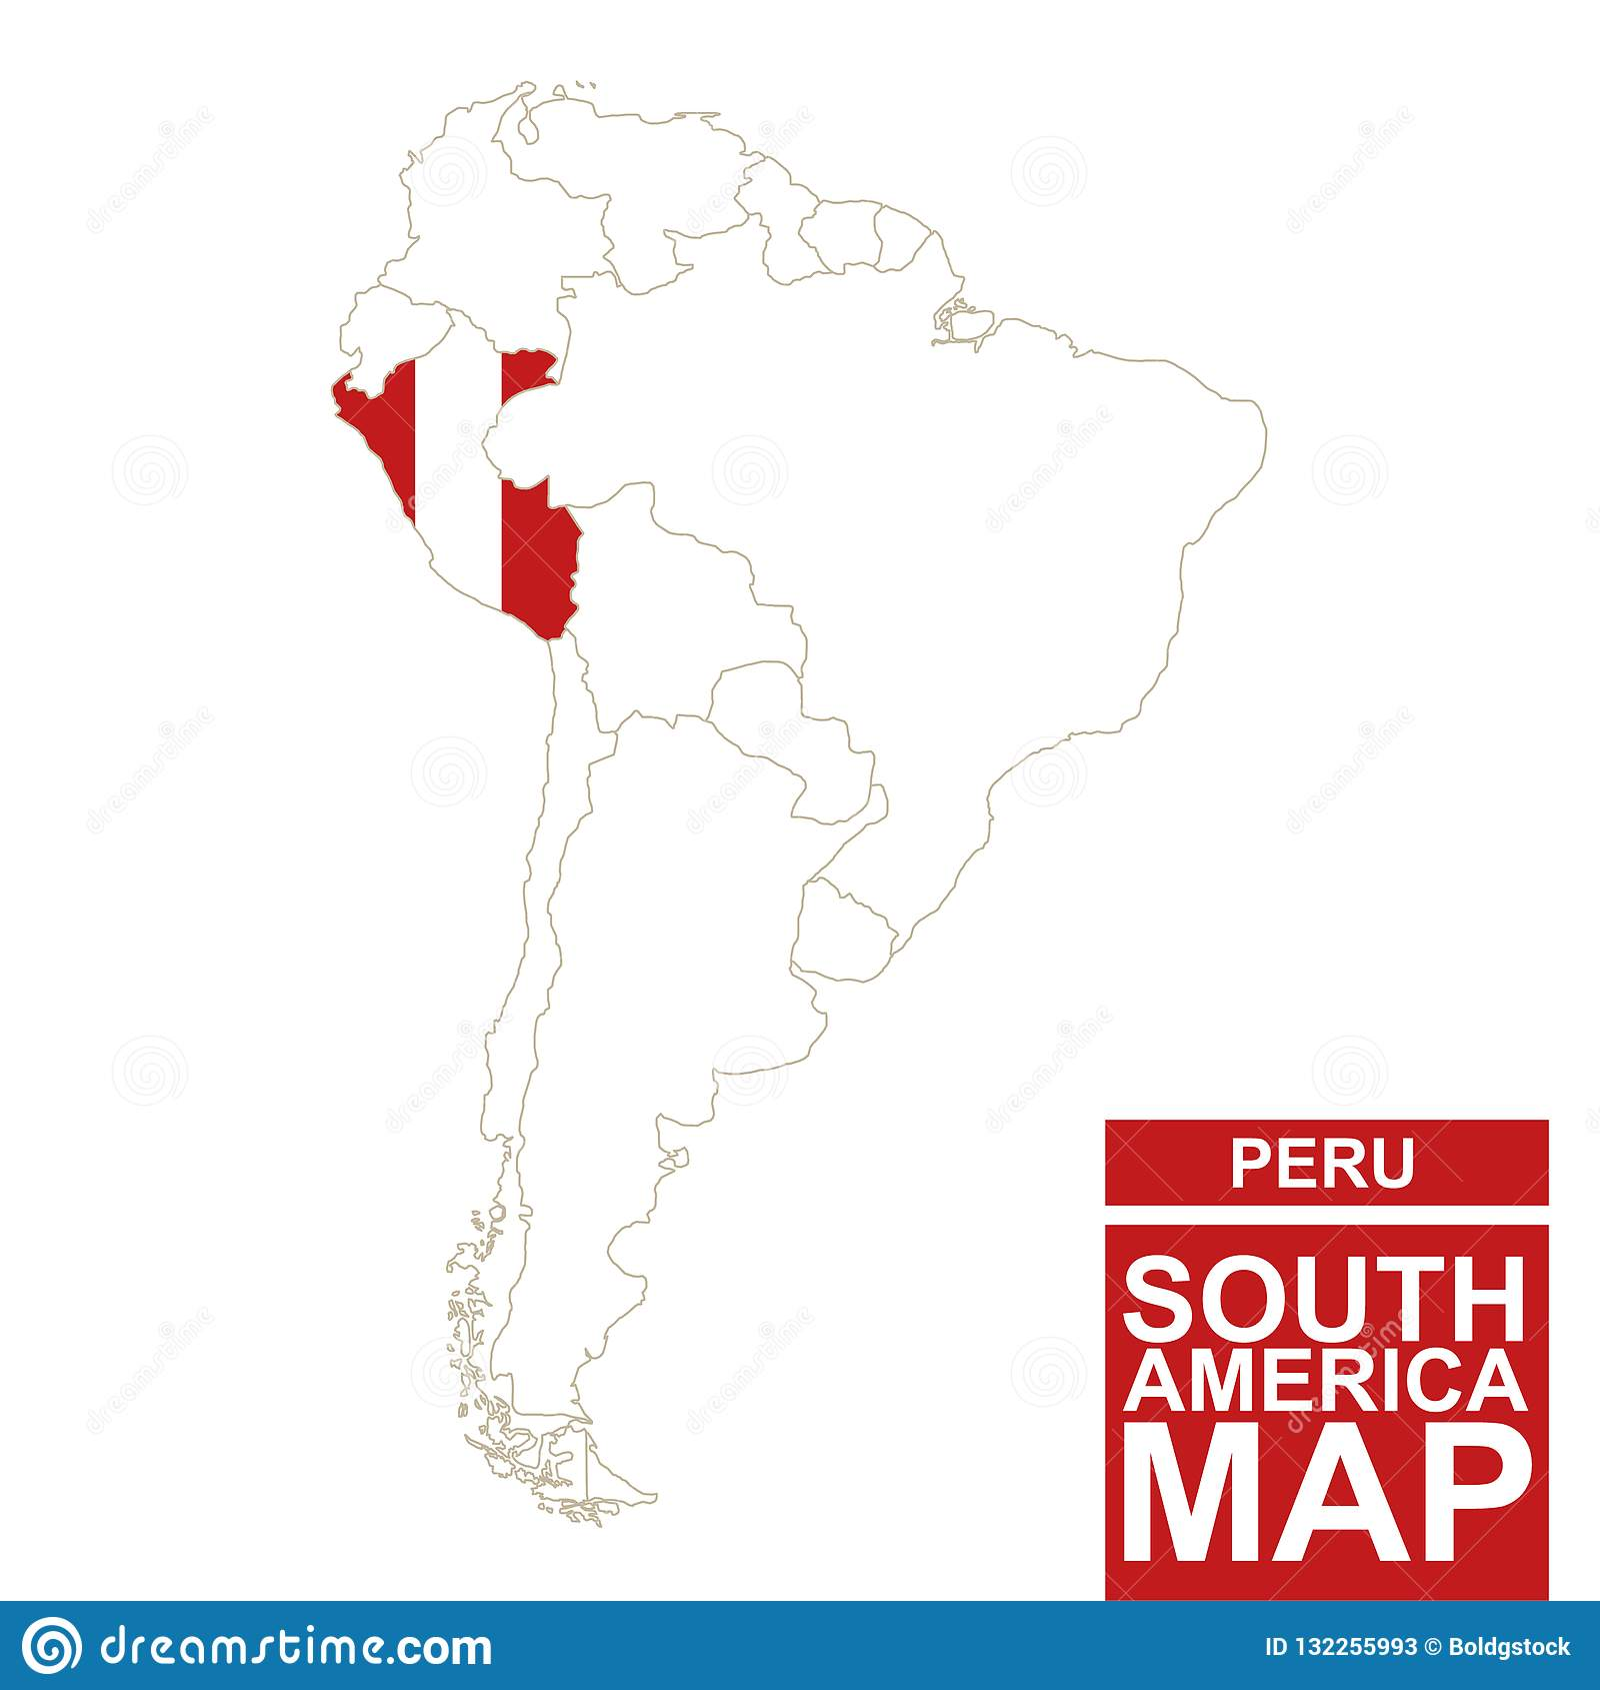 Peru Karte Südamerika.Südamerika Höhenlinienkarte Mit Hervorgehobenem Peru Vektor